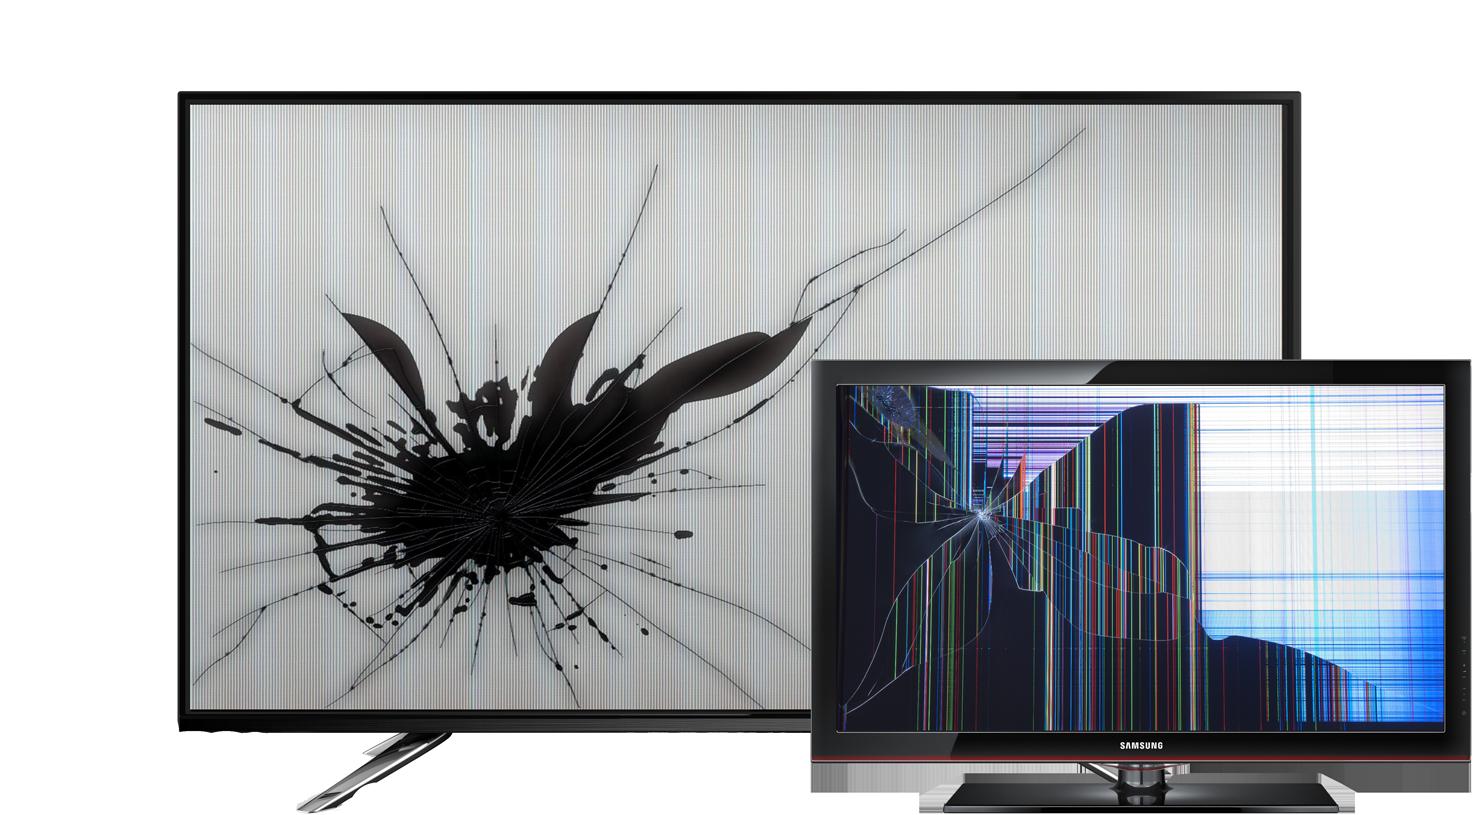 Repair cork centre screen. Clipart tv broken tv